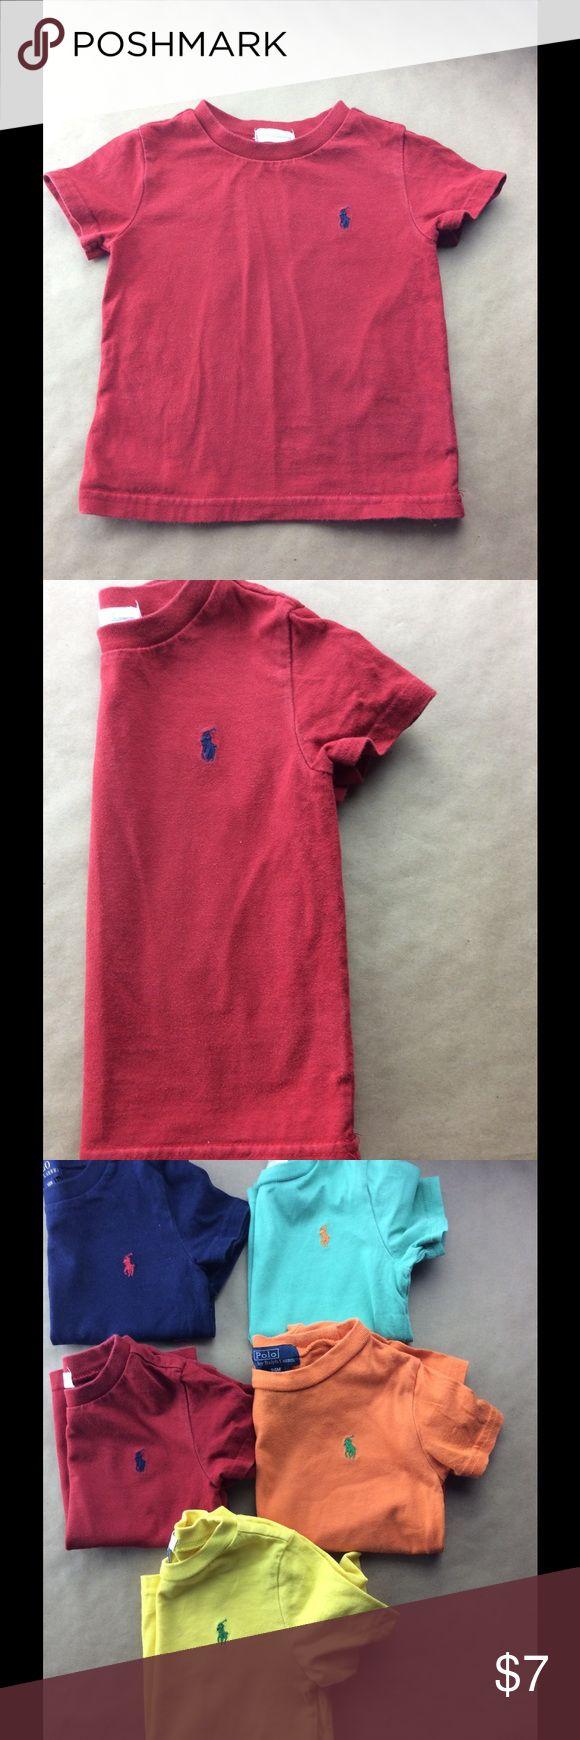 Polo Tee shirt Red classic Polo Tee Polo by Ralph Lauren Shirts & Tops Tees - Short Sleeve